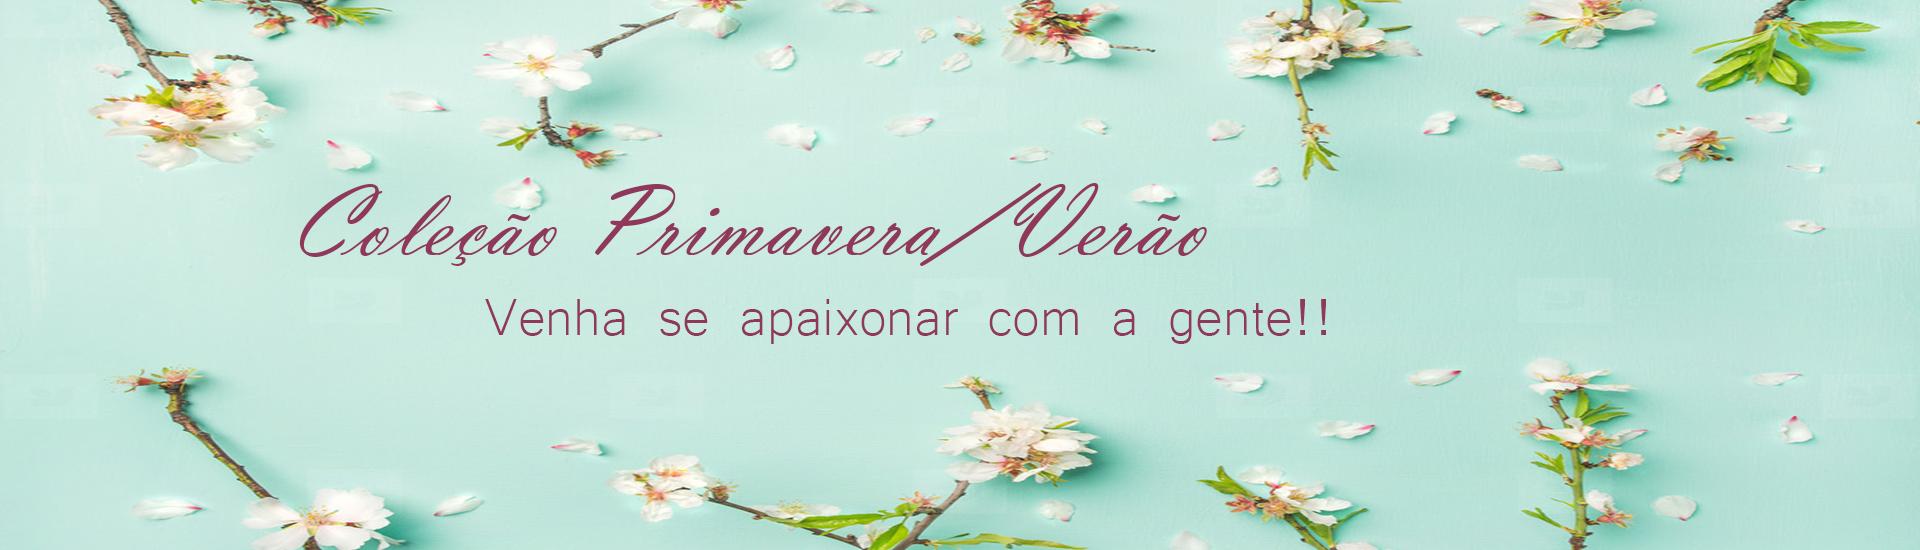 lavinnystore.com.br 1